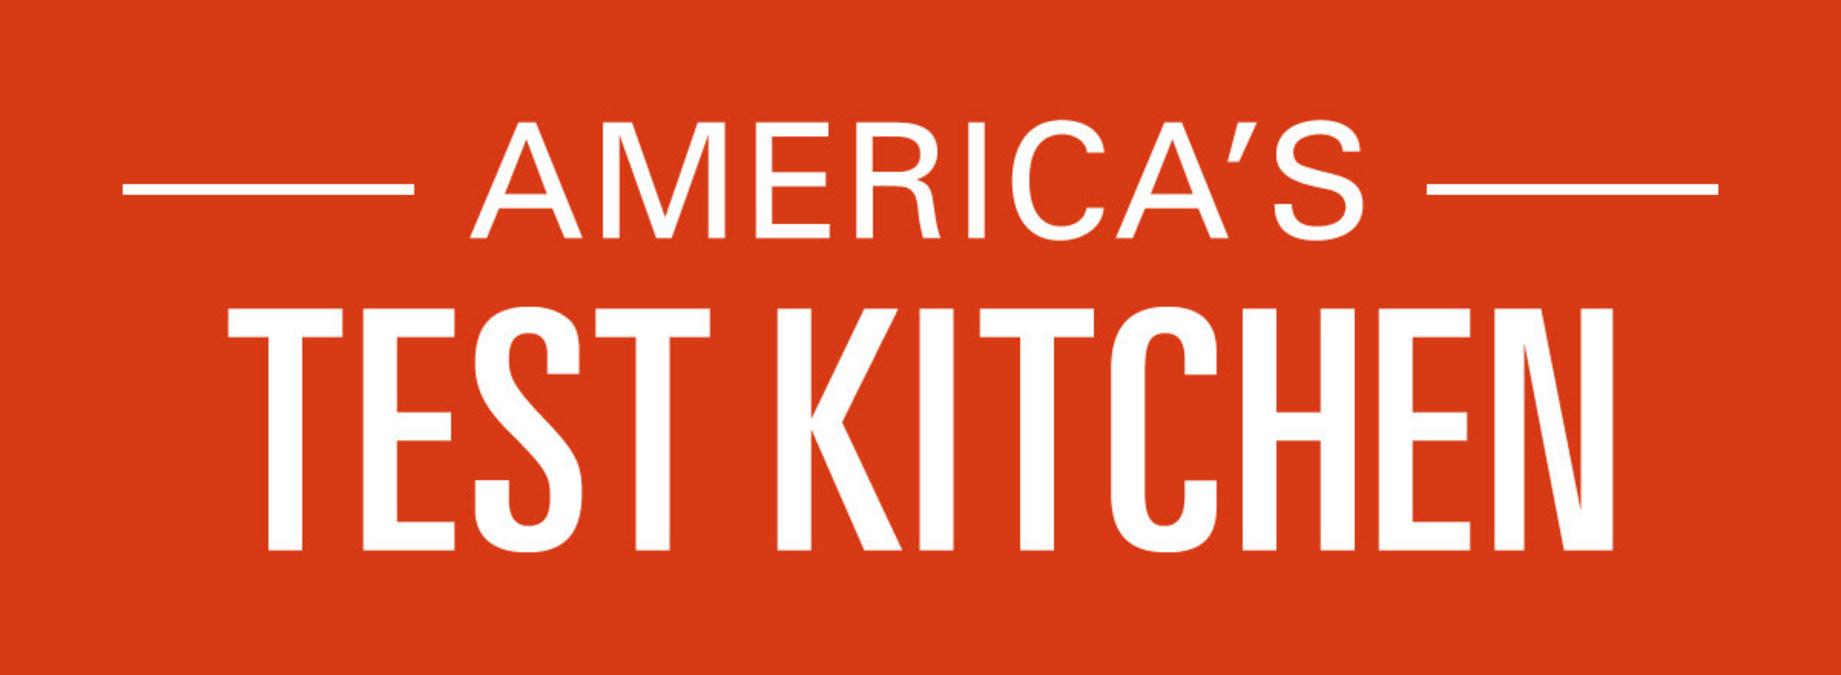 Test Kitchen Logo America's Test Kitchen And Sourcebooks Announce Groundbreaking